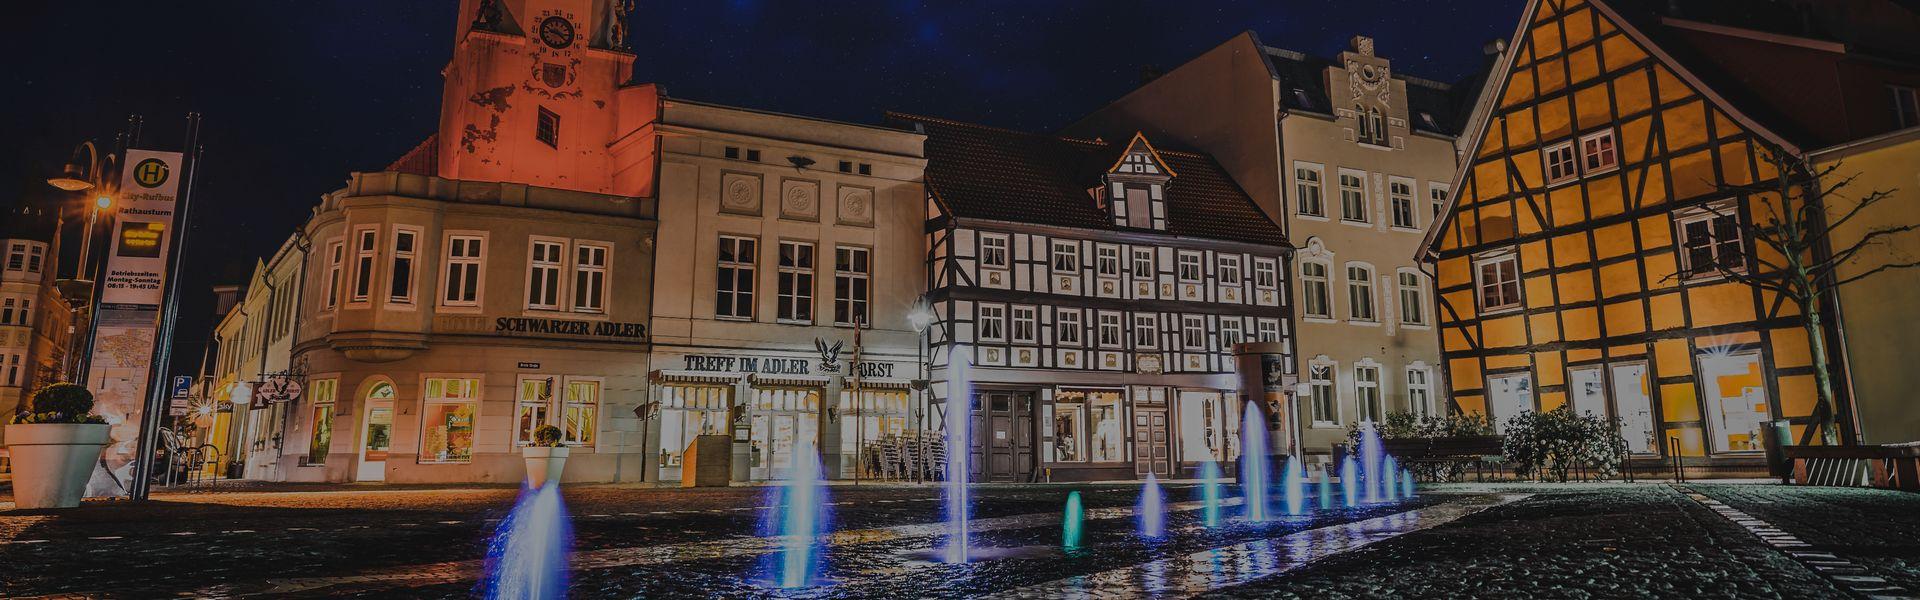 Reisetipps-Altmark-Salzwedel